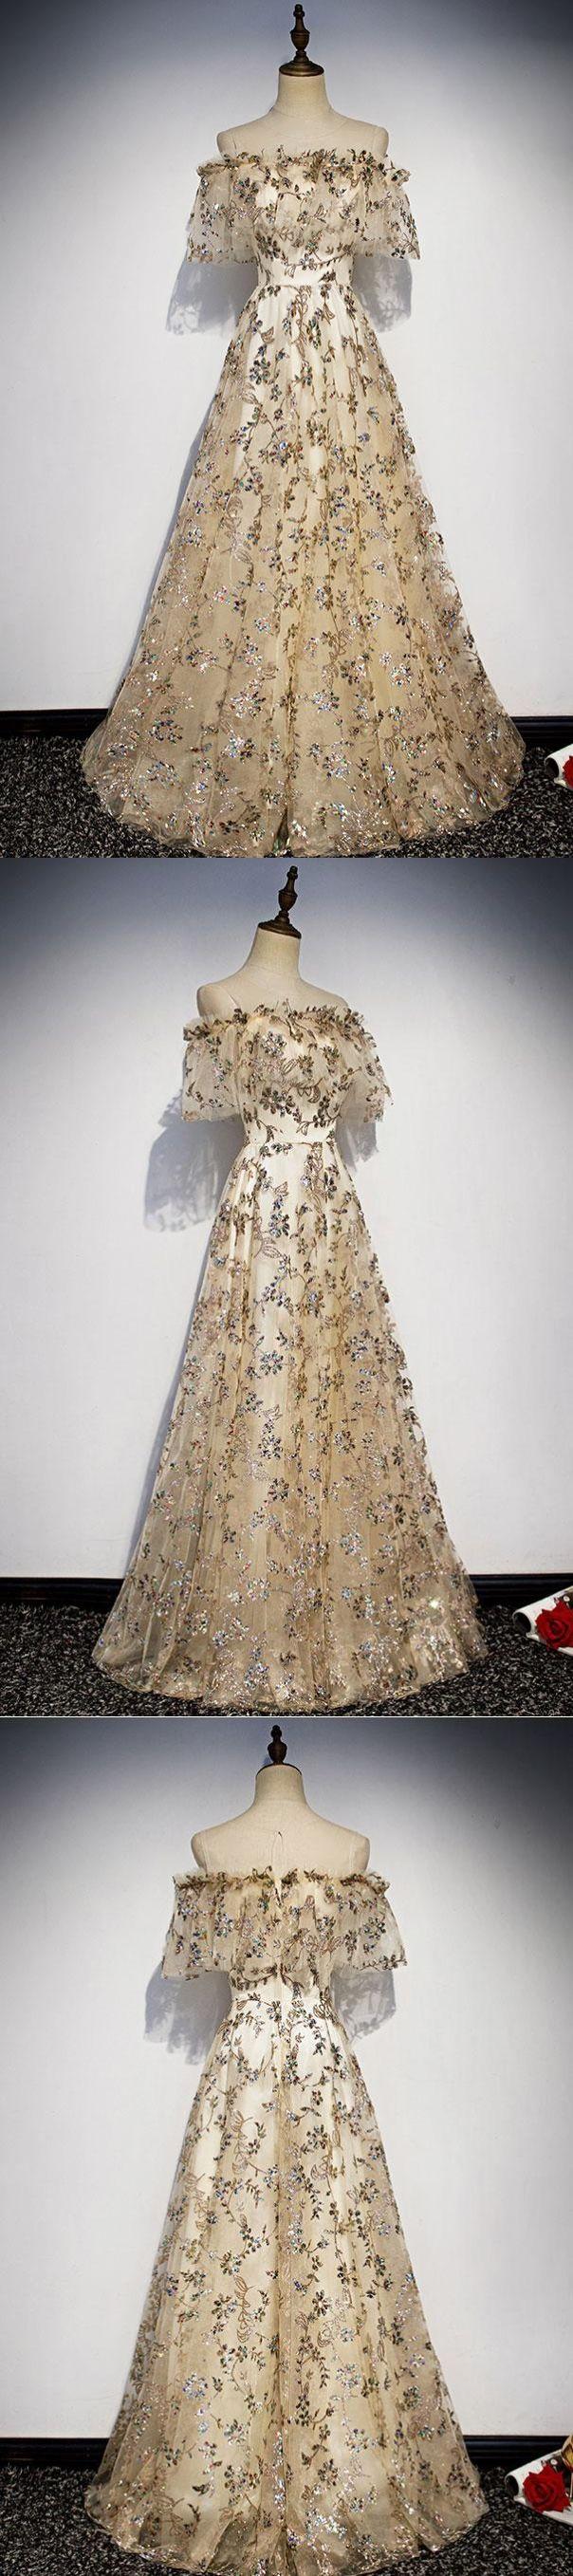 Lace Prom Dresses Scoop Floor-length Aline Long Tulle Gorgeous Prom Dress JKL1632 - Aida